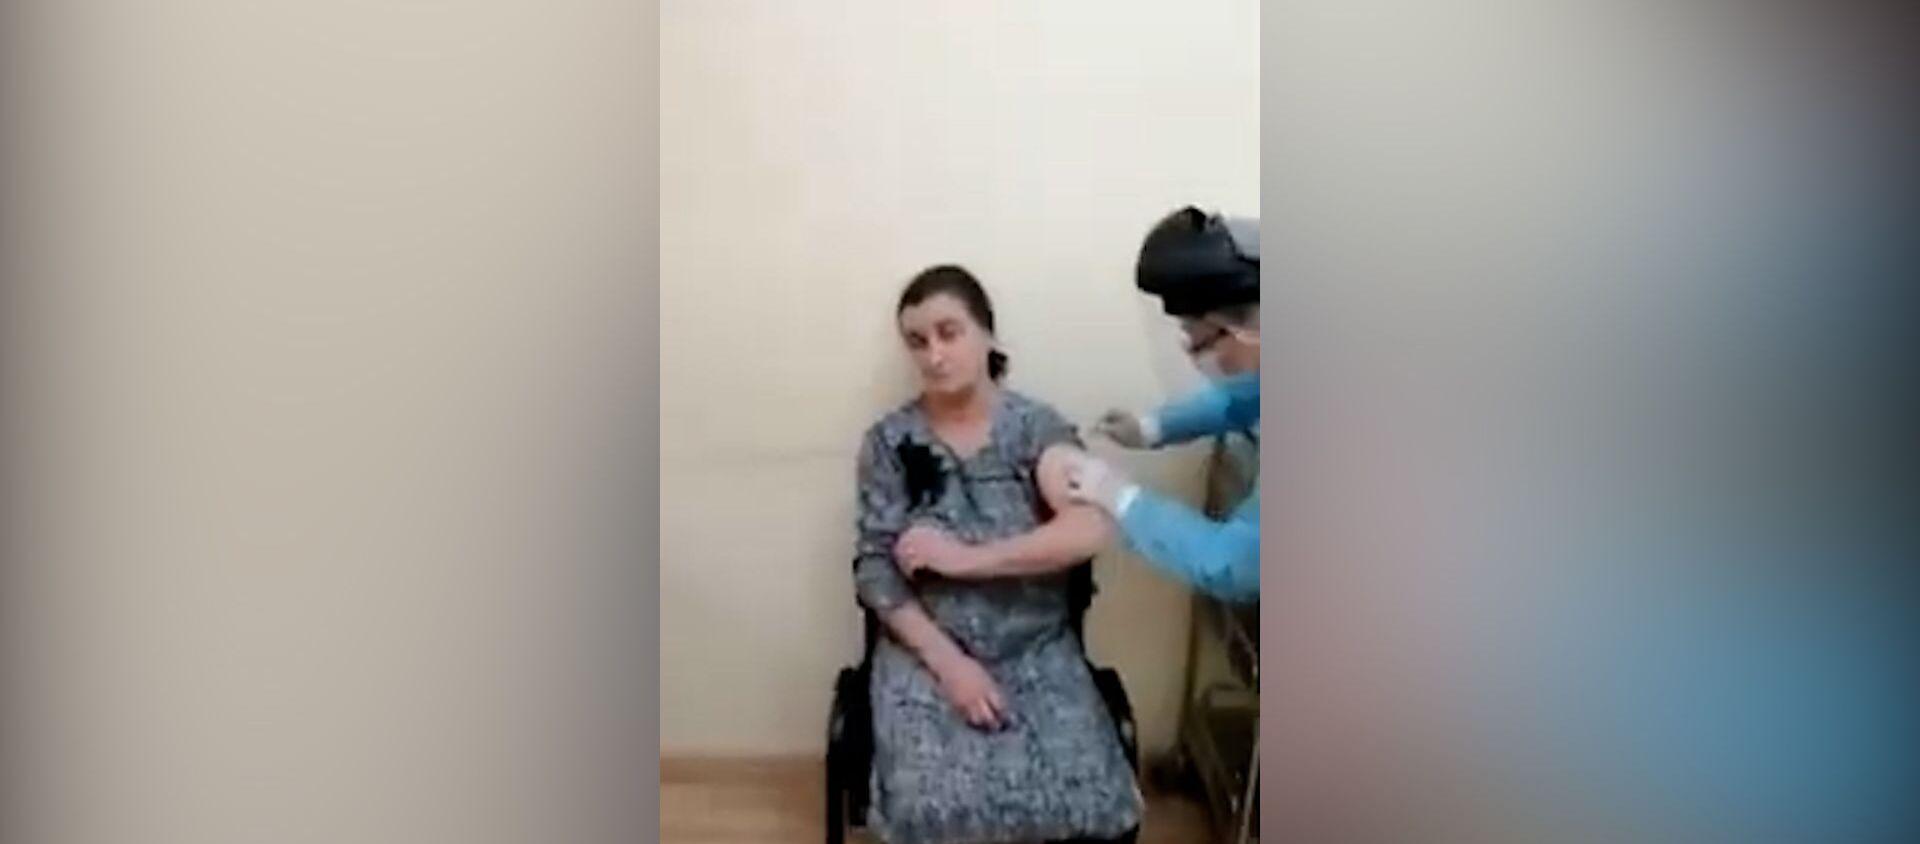 Как проходит вакцинация лиц старше 65 лет – видео - Sputnik Азербайджан, 1920, 08.02.2021